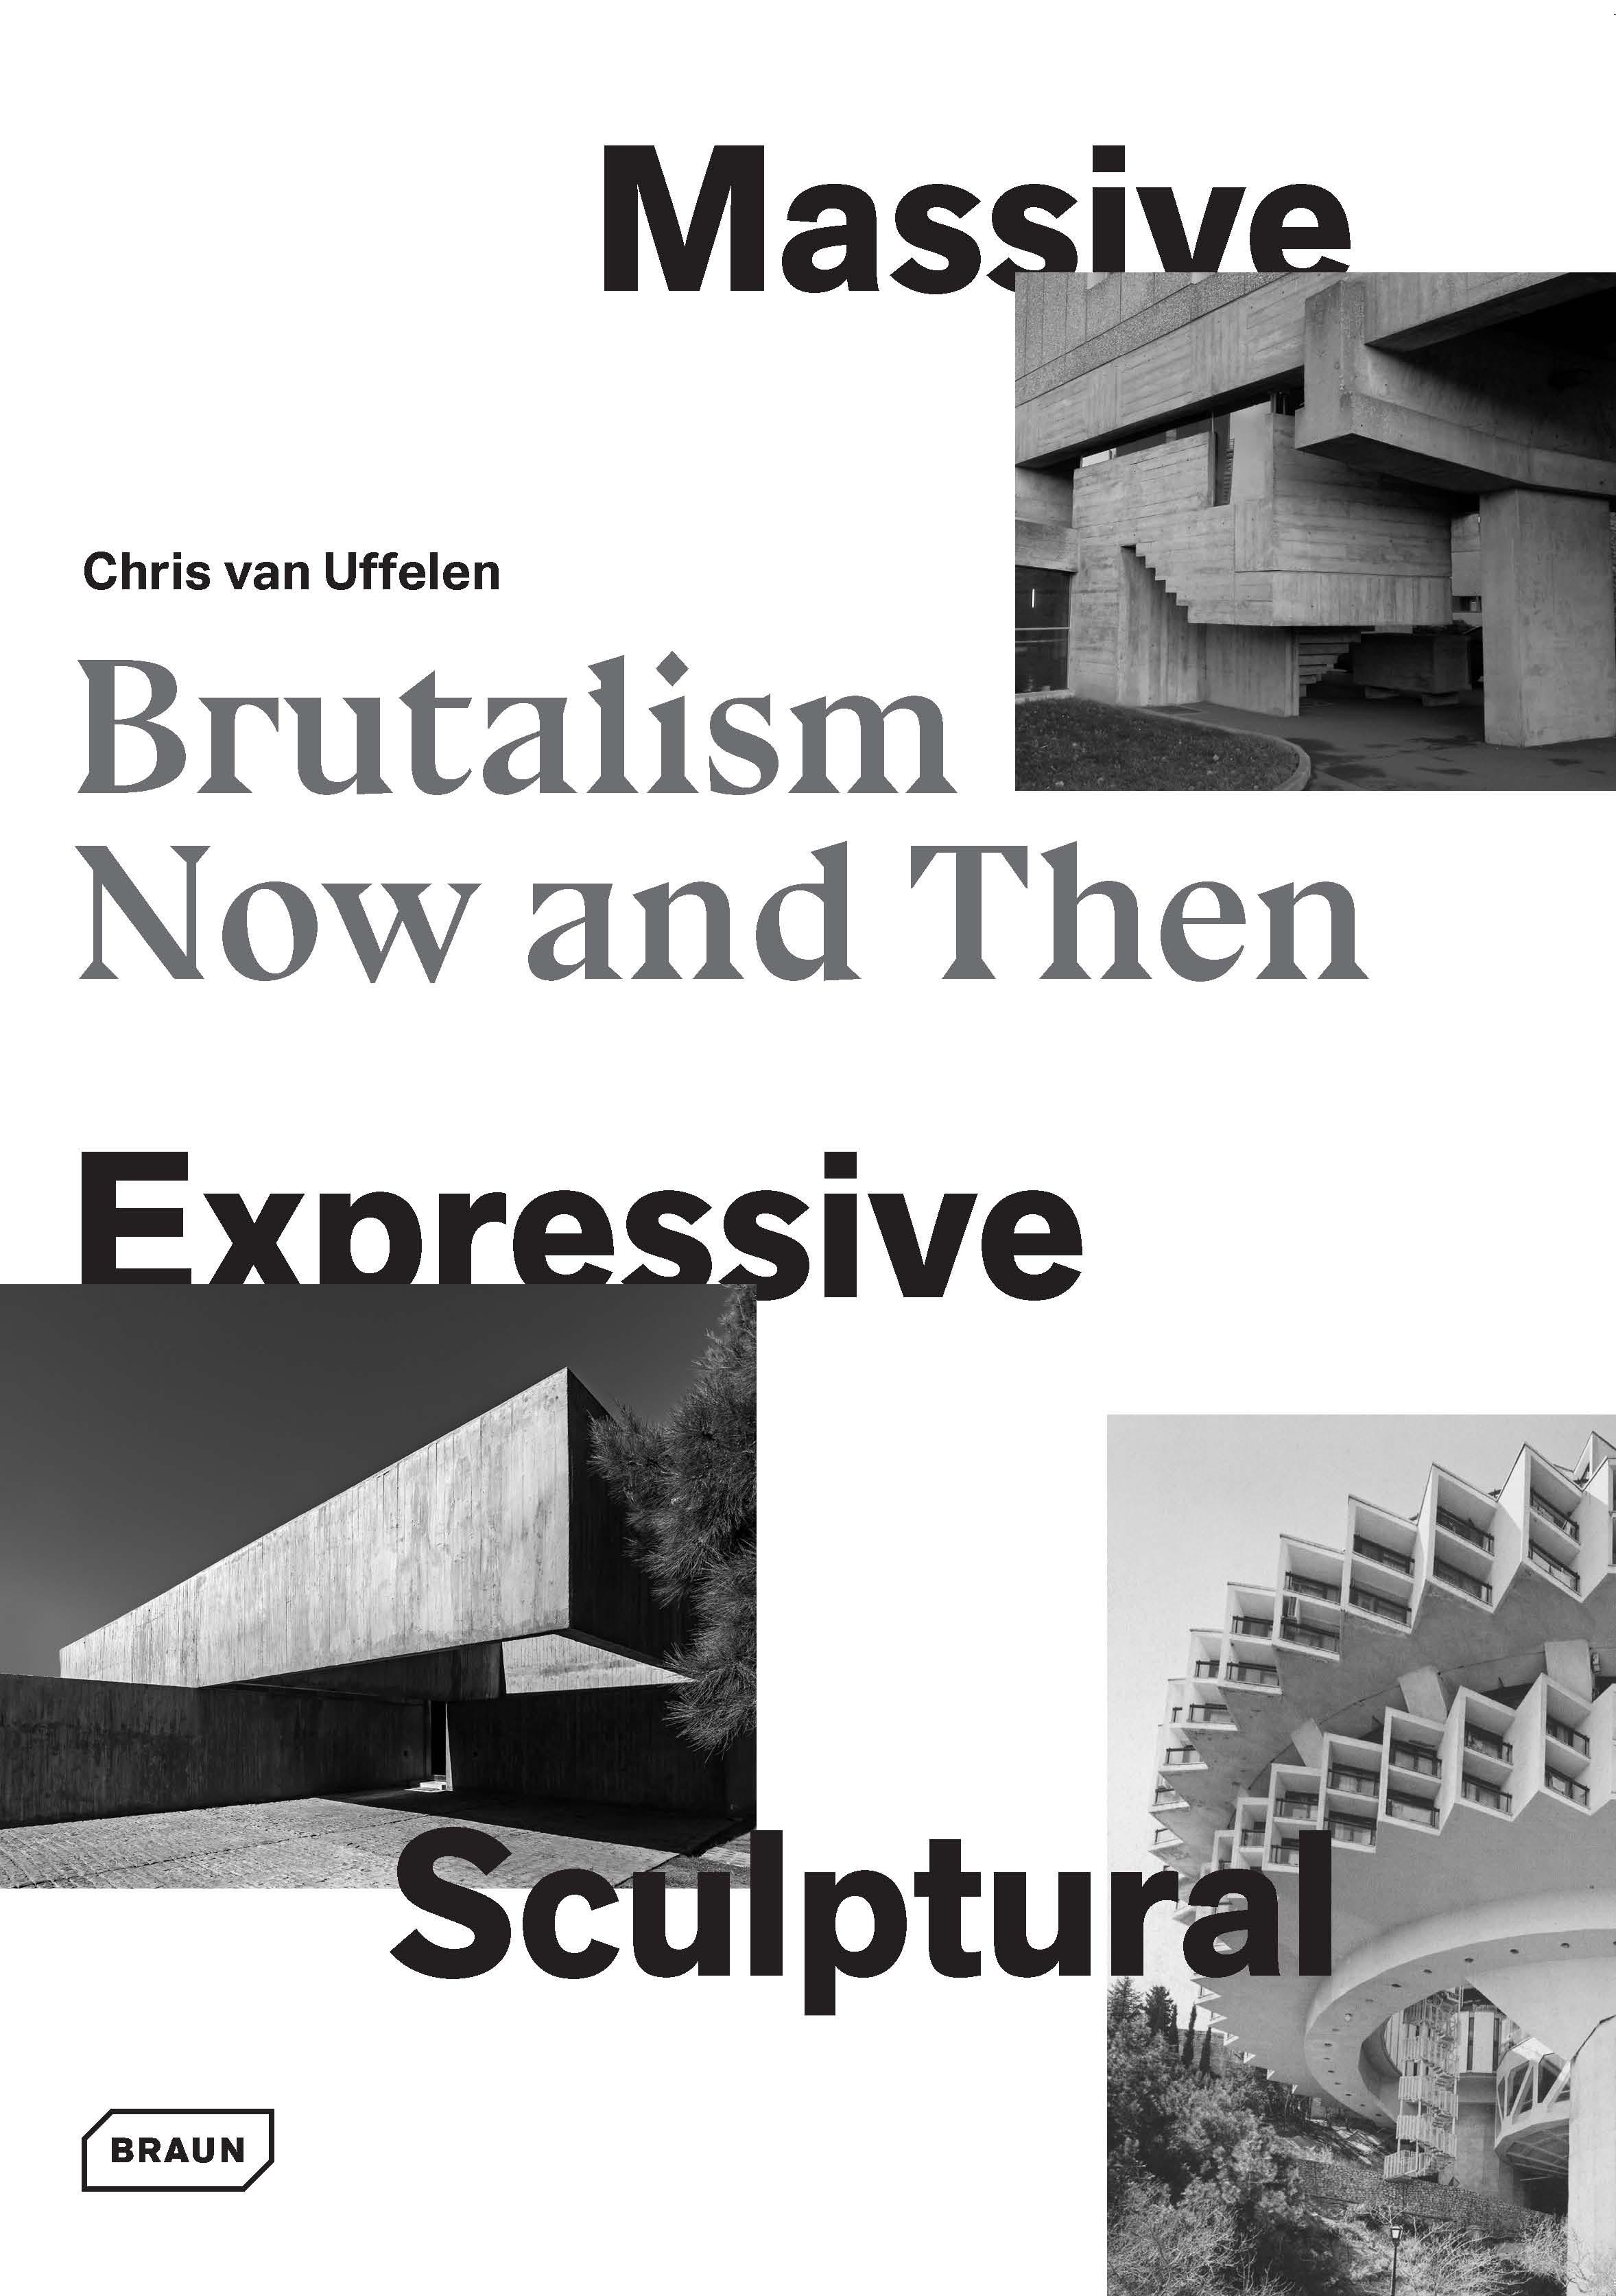 Massive, Expressive, Sculptural Chris van Uffelen 9783037682241